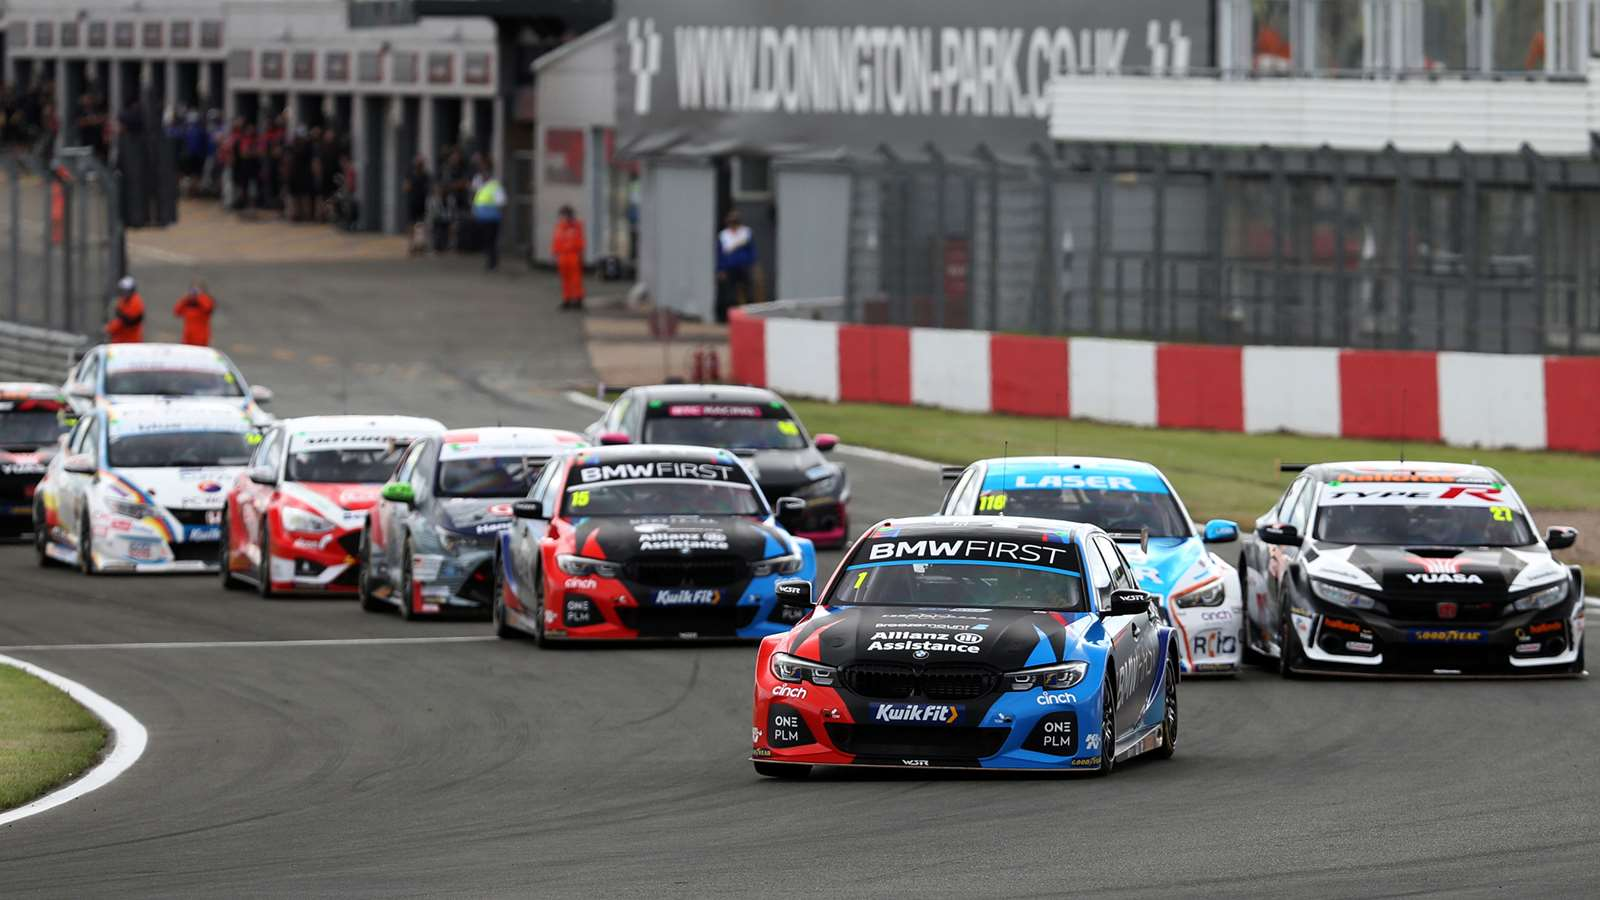 BTCC 2020 Donington Park Colin Turkington (BMW) leads Ash Sutton (Infiniti) and Dan Cammish (Honda)